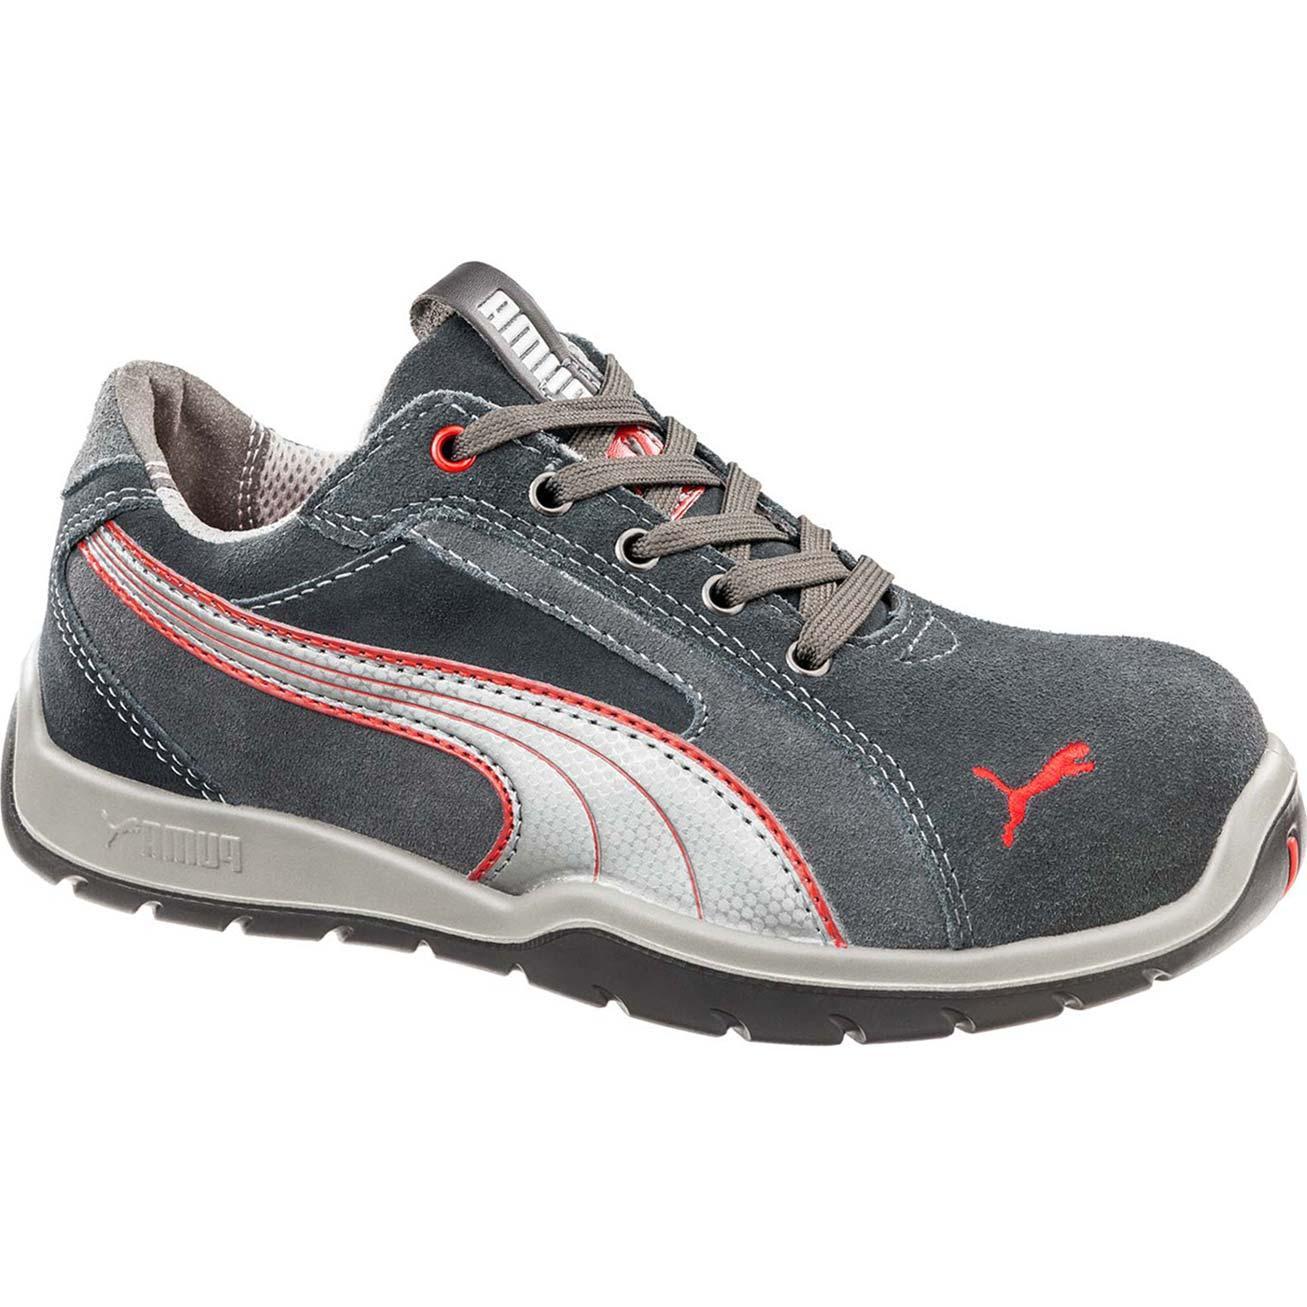 Men S Puma Steel Toe Shoes Black